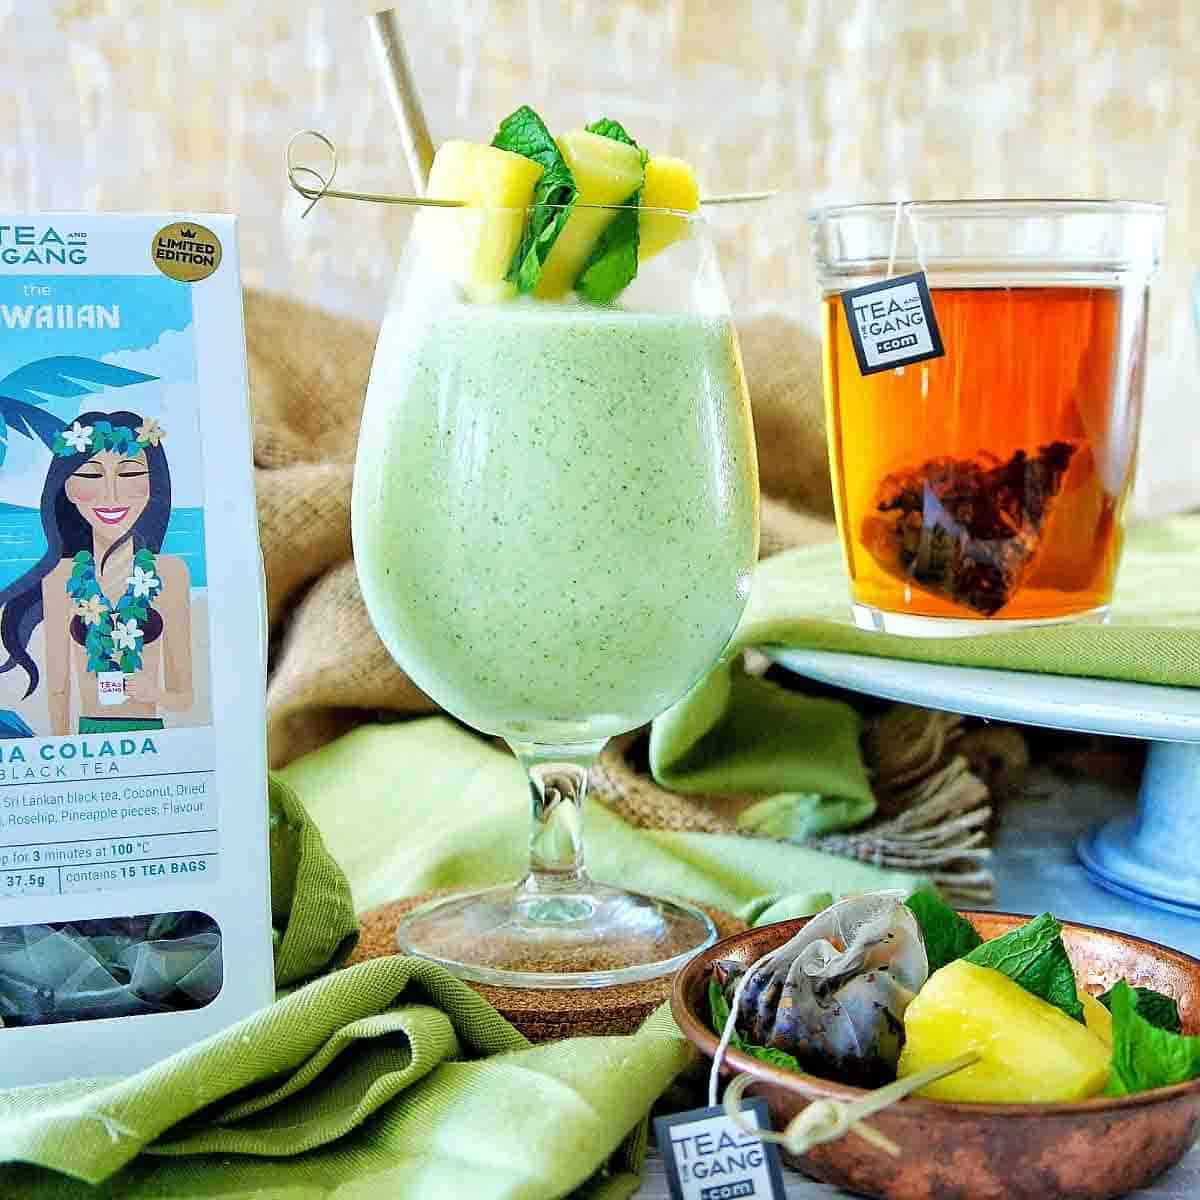 Pina Colada Smoothie with pineapple garnish